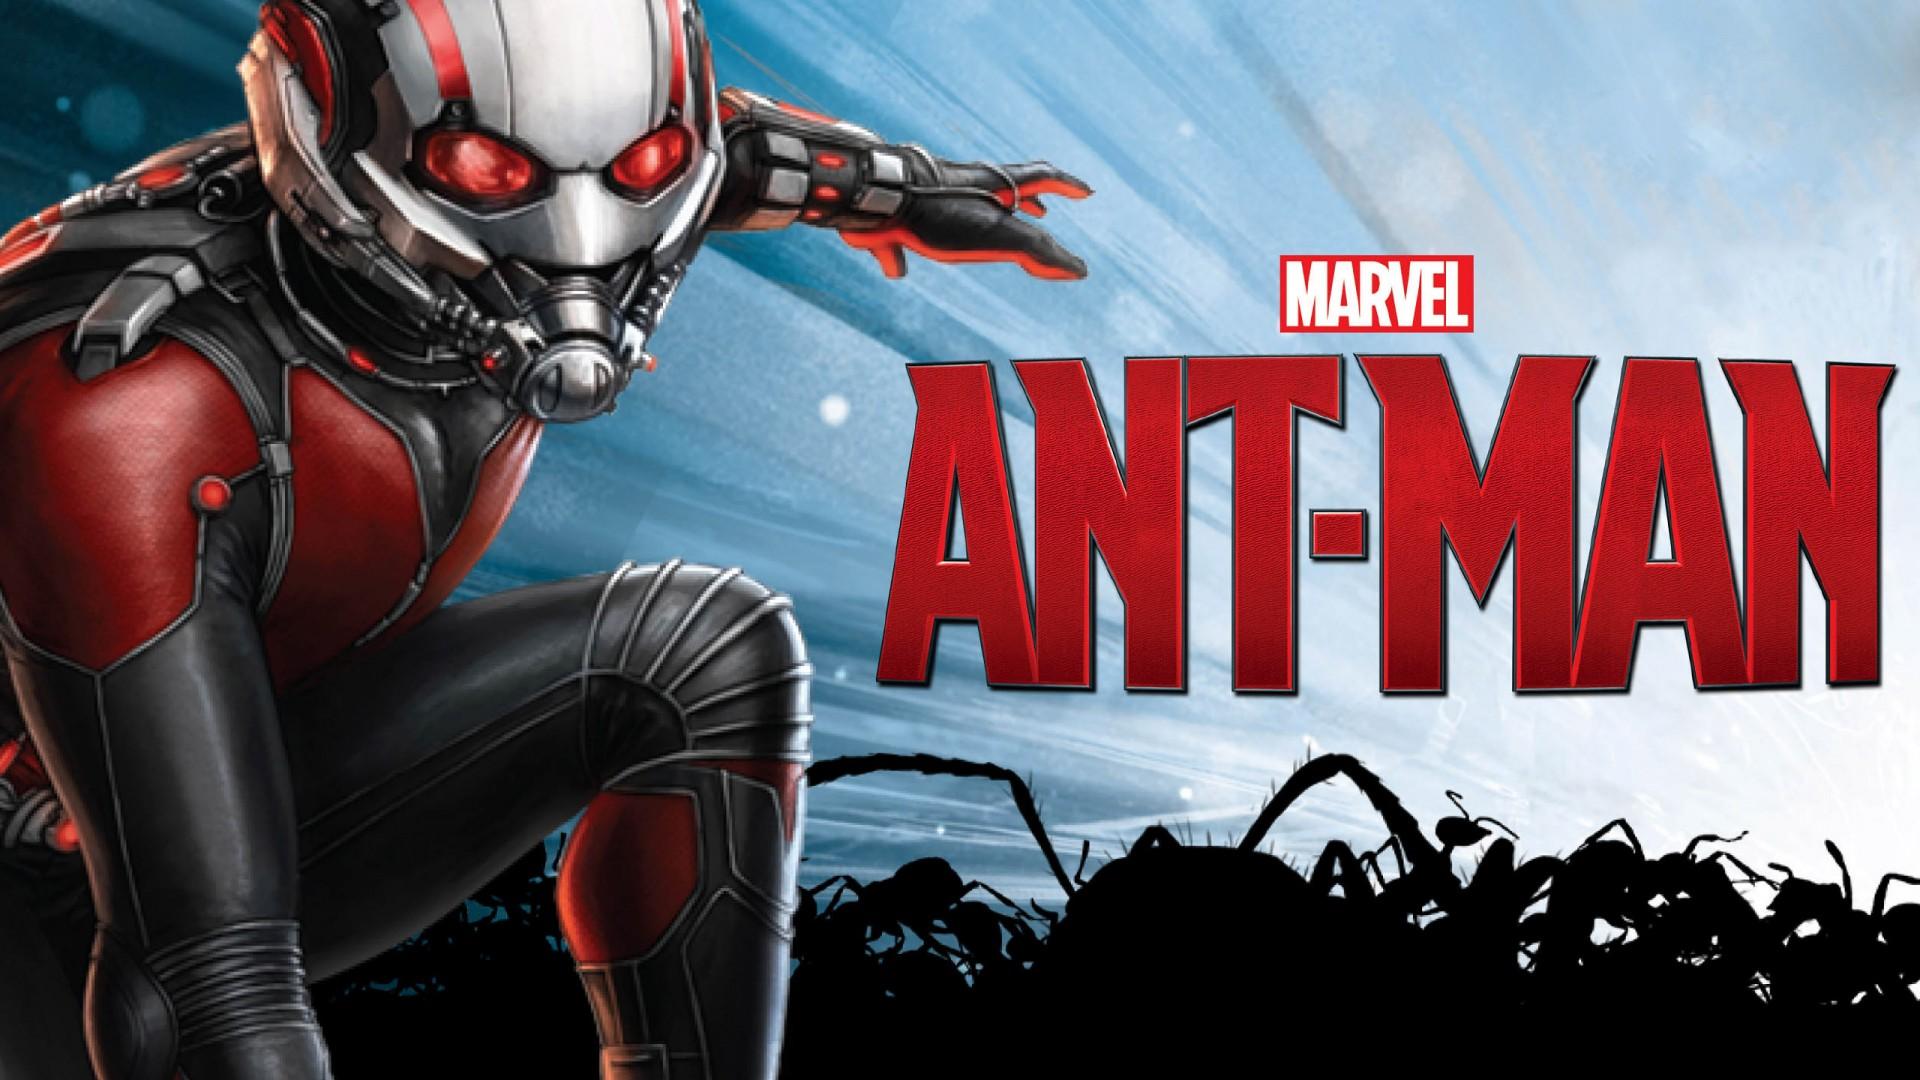 Ant-Man (2015) [Movie]